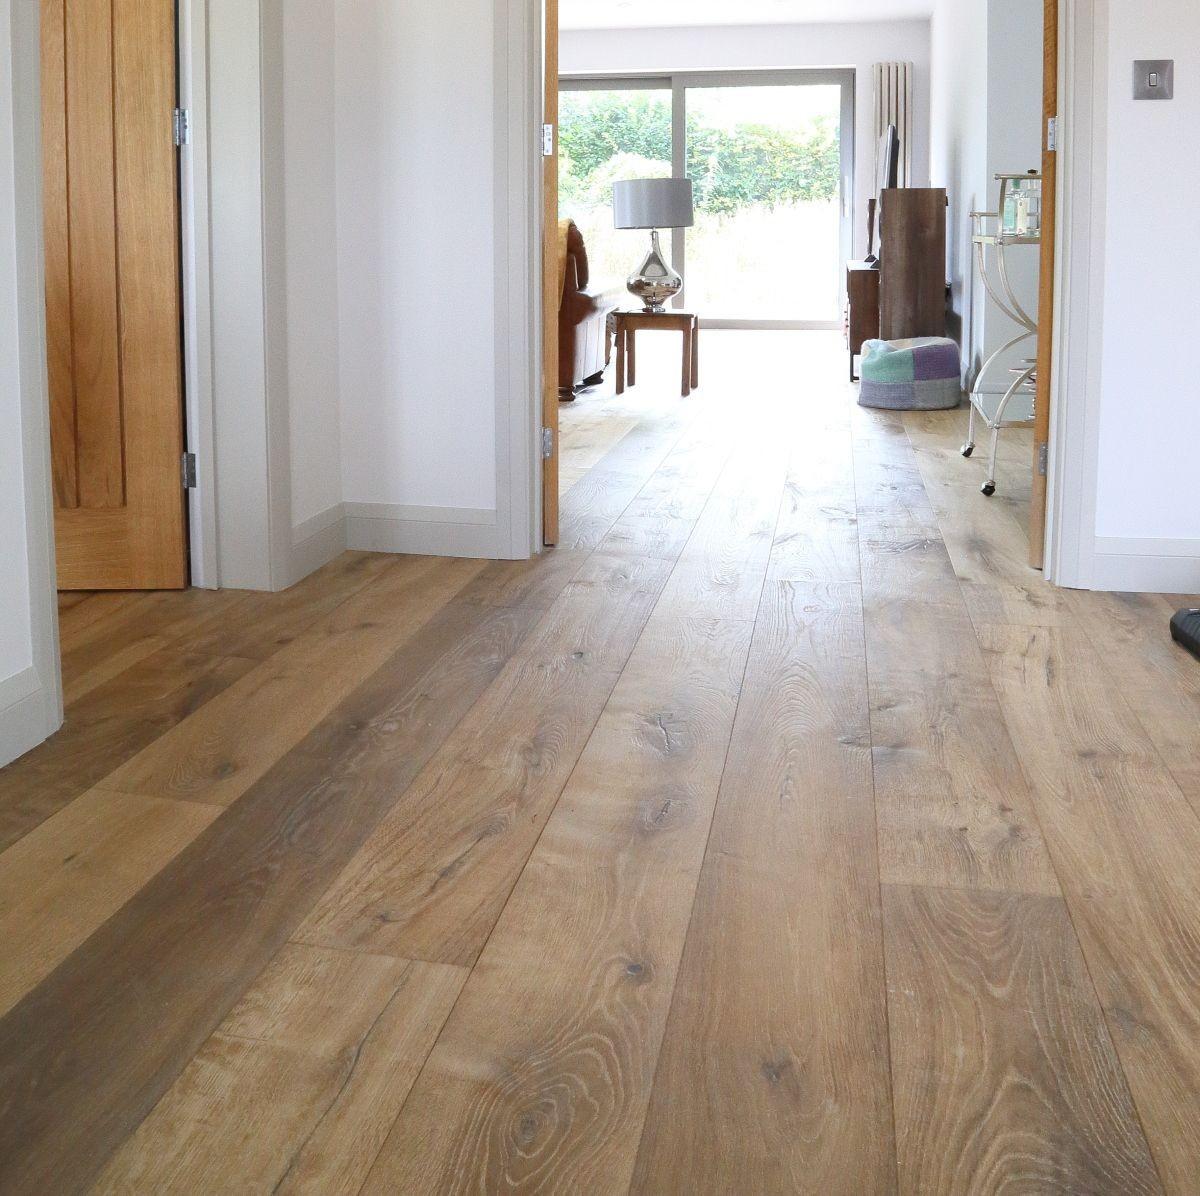 hardwood floor grey oak of 18 fresh oak hardwood floors pictures dizpos com throughout oak hardwood floors best of sandy weathered oak flooring 1200 1196 casa gallery of 18